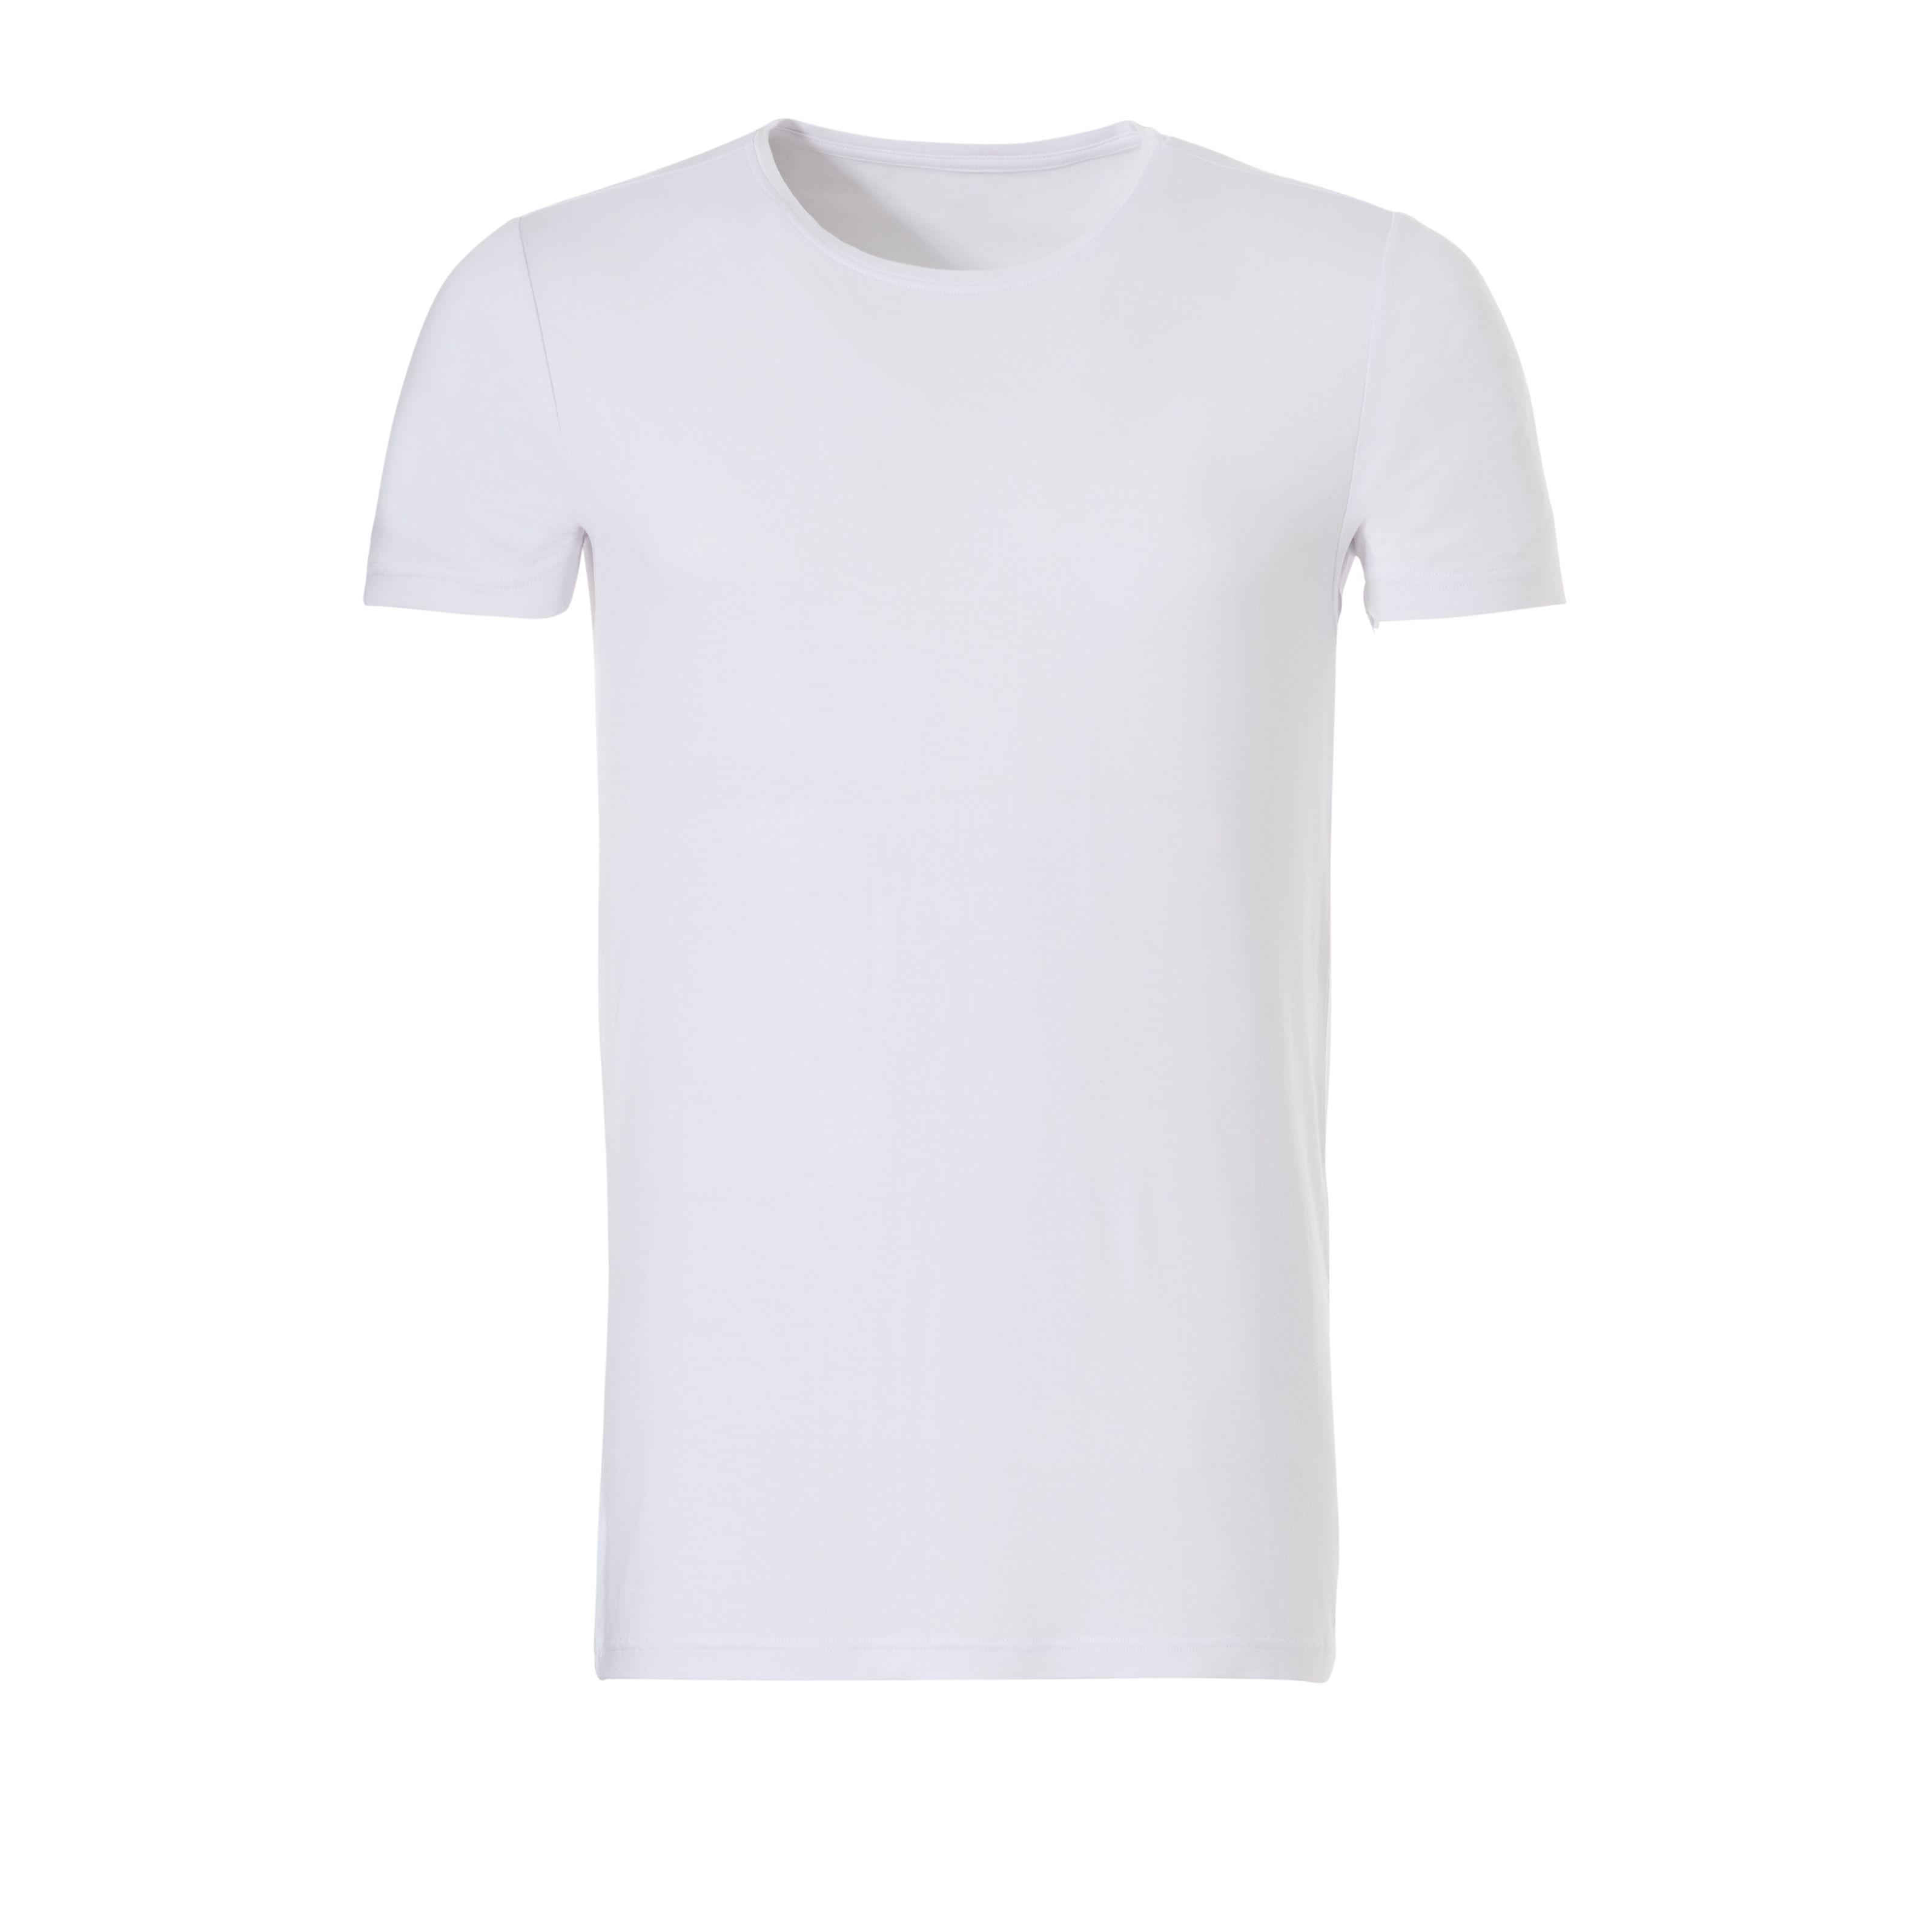 Ten Cate Men Basic t-shirt Bamboo White